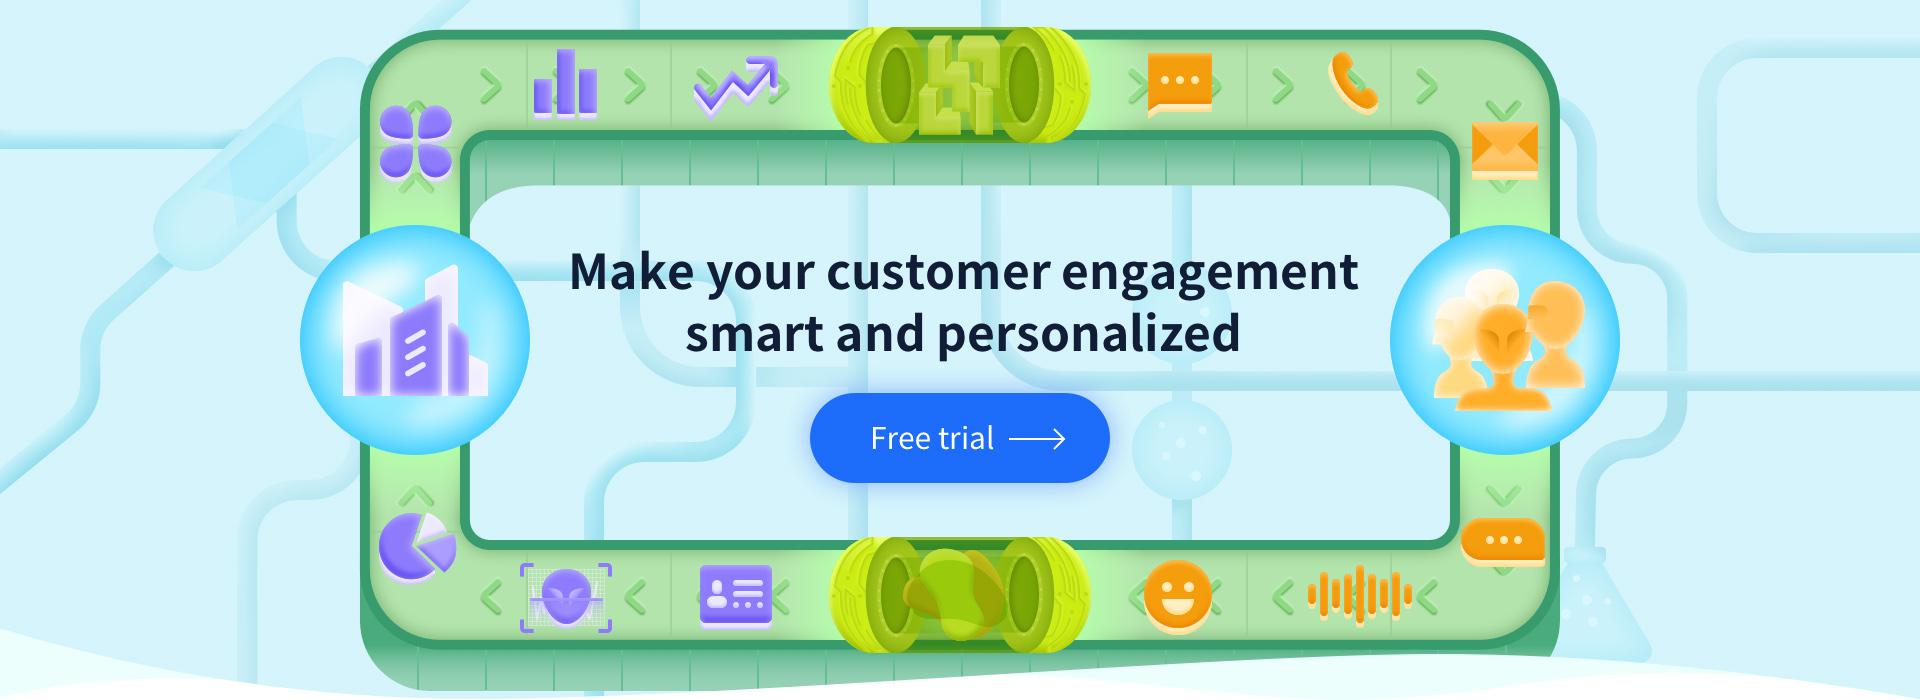 AI customer engagemen